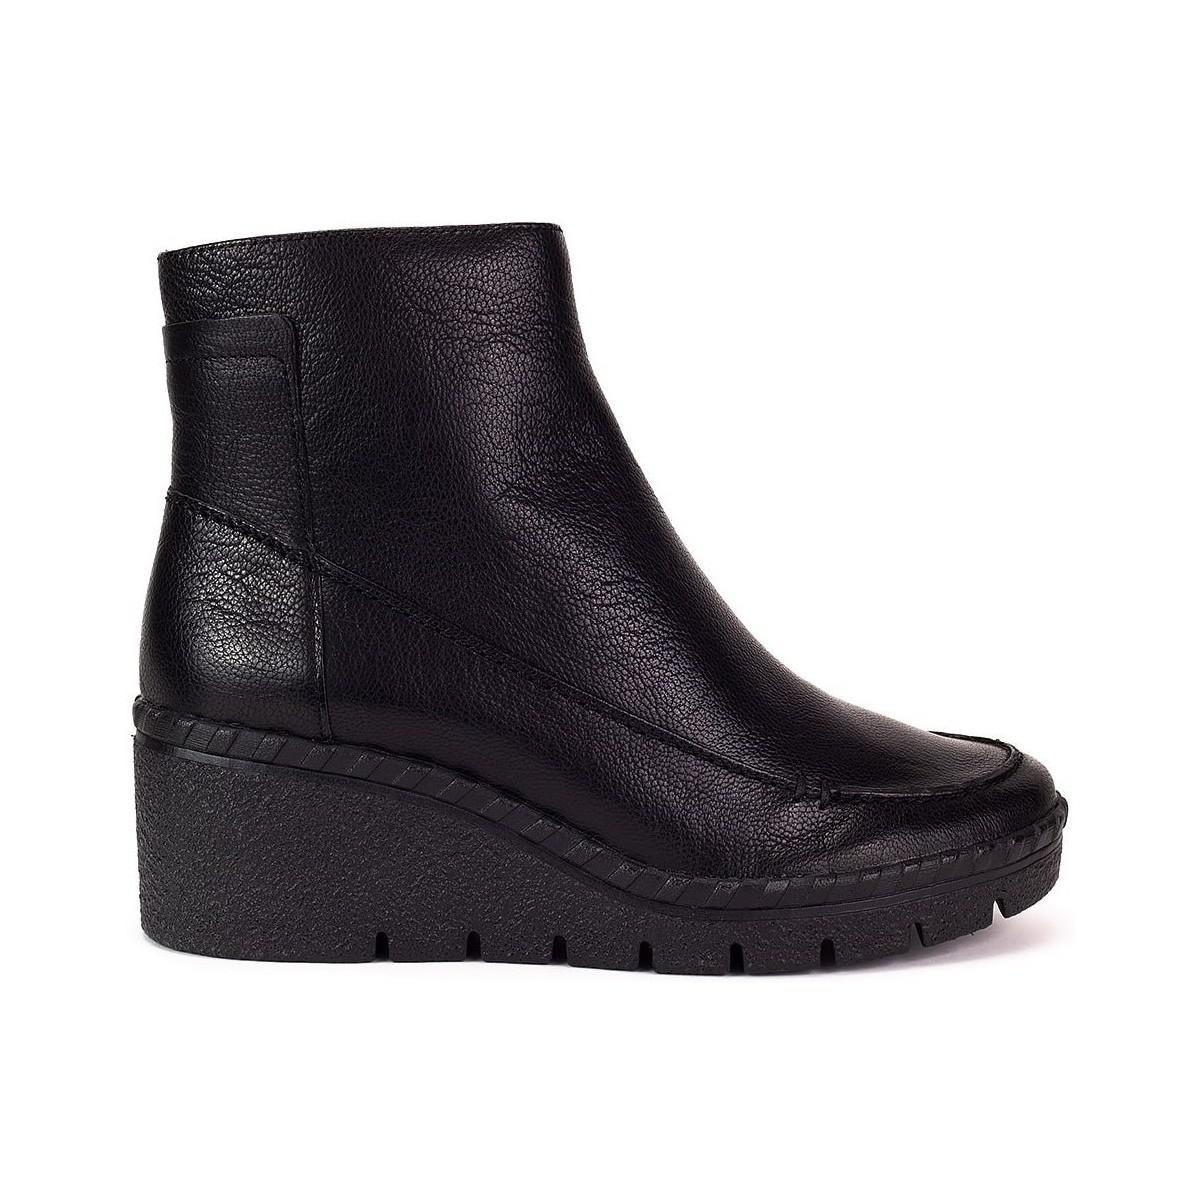 52f000bdd99 Geox Wiva Wedge Women's Low Ankle Boots In Black